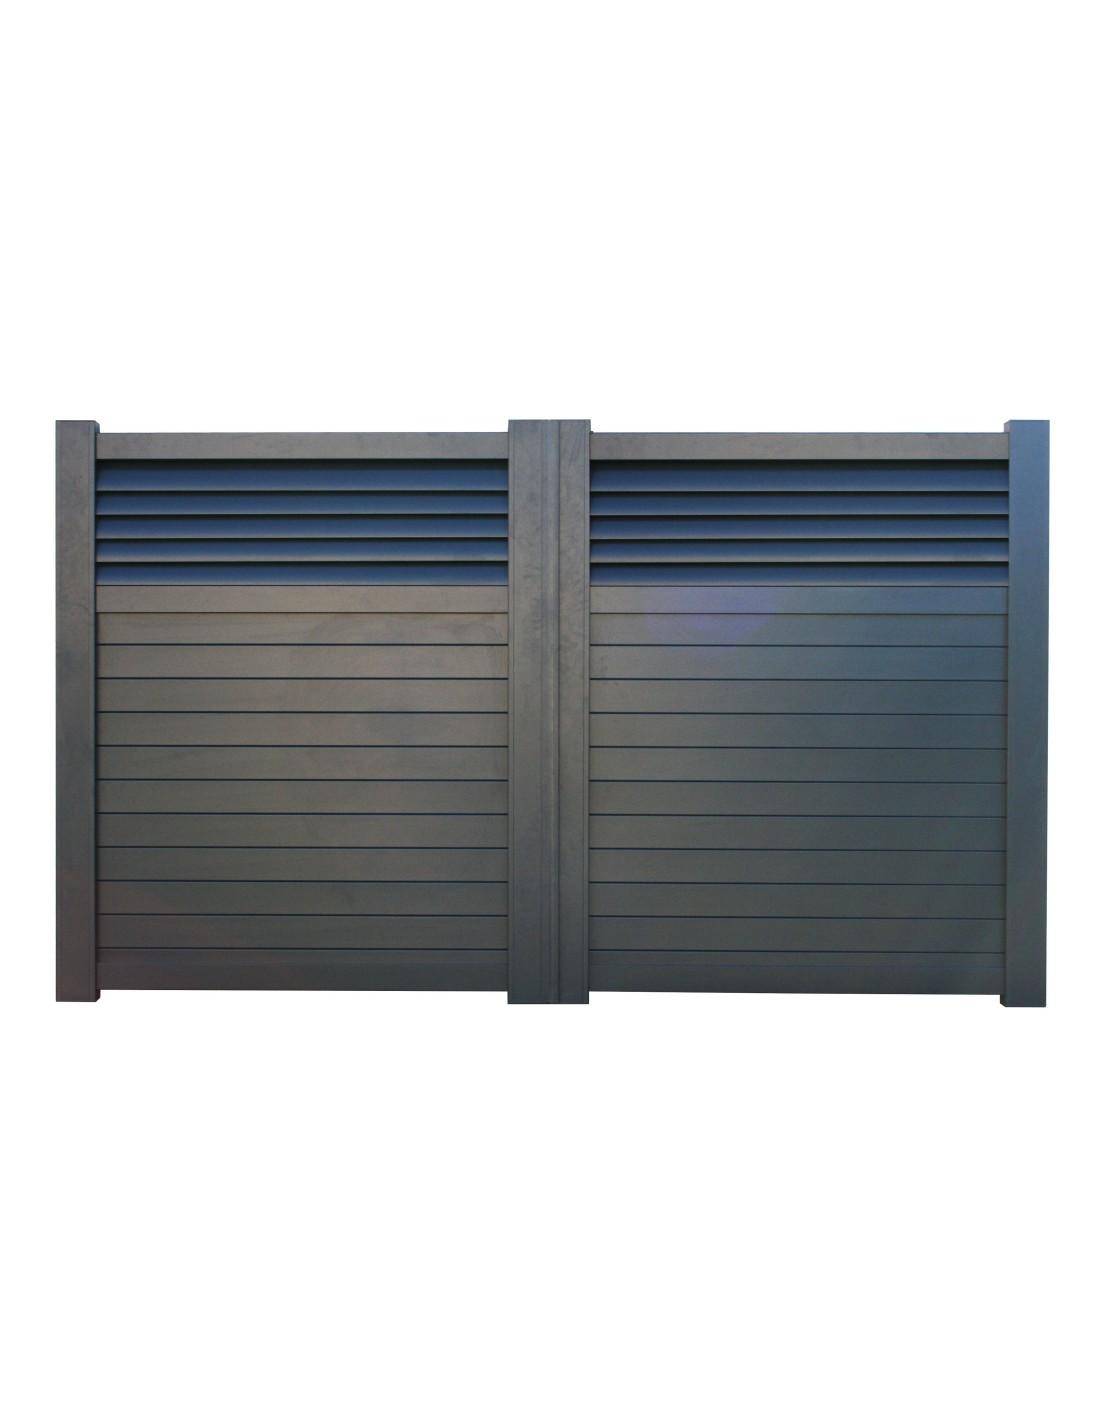 Portail aluminium battant motoris justina 3 50m x1 80 ebay - Portail 3 50m ...